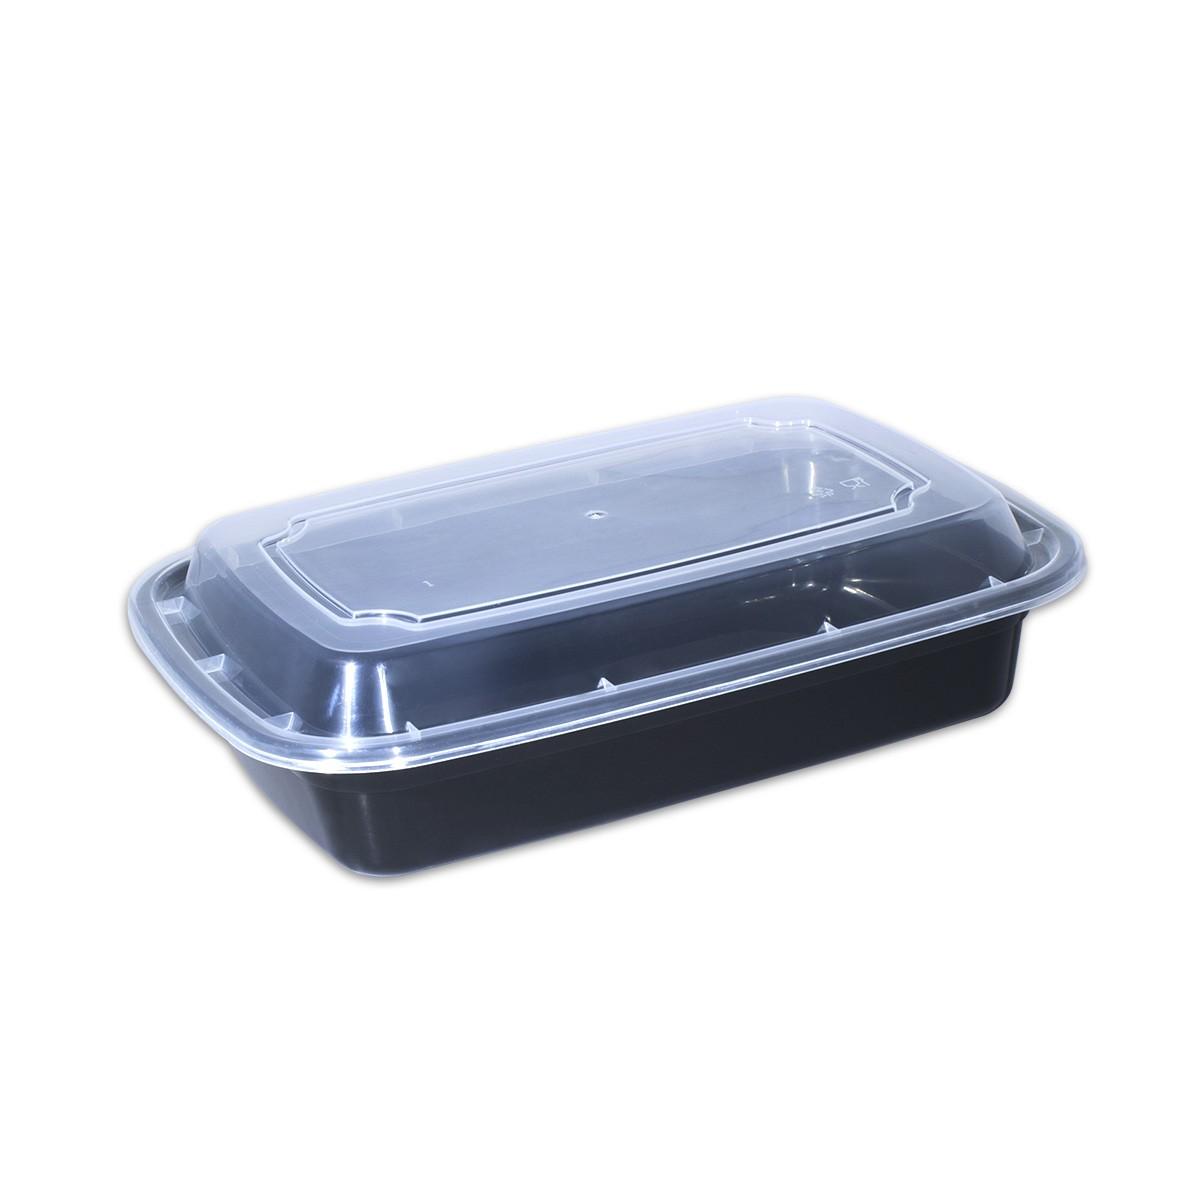 Black Rect. Microwavable Container 28oz - w/Lid  | 150pcs